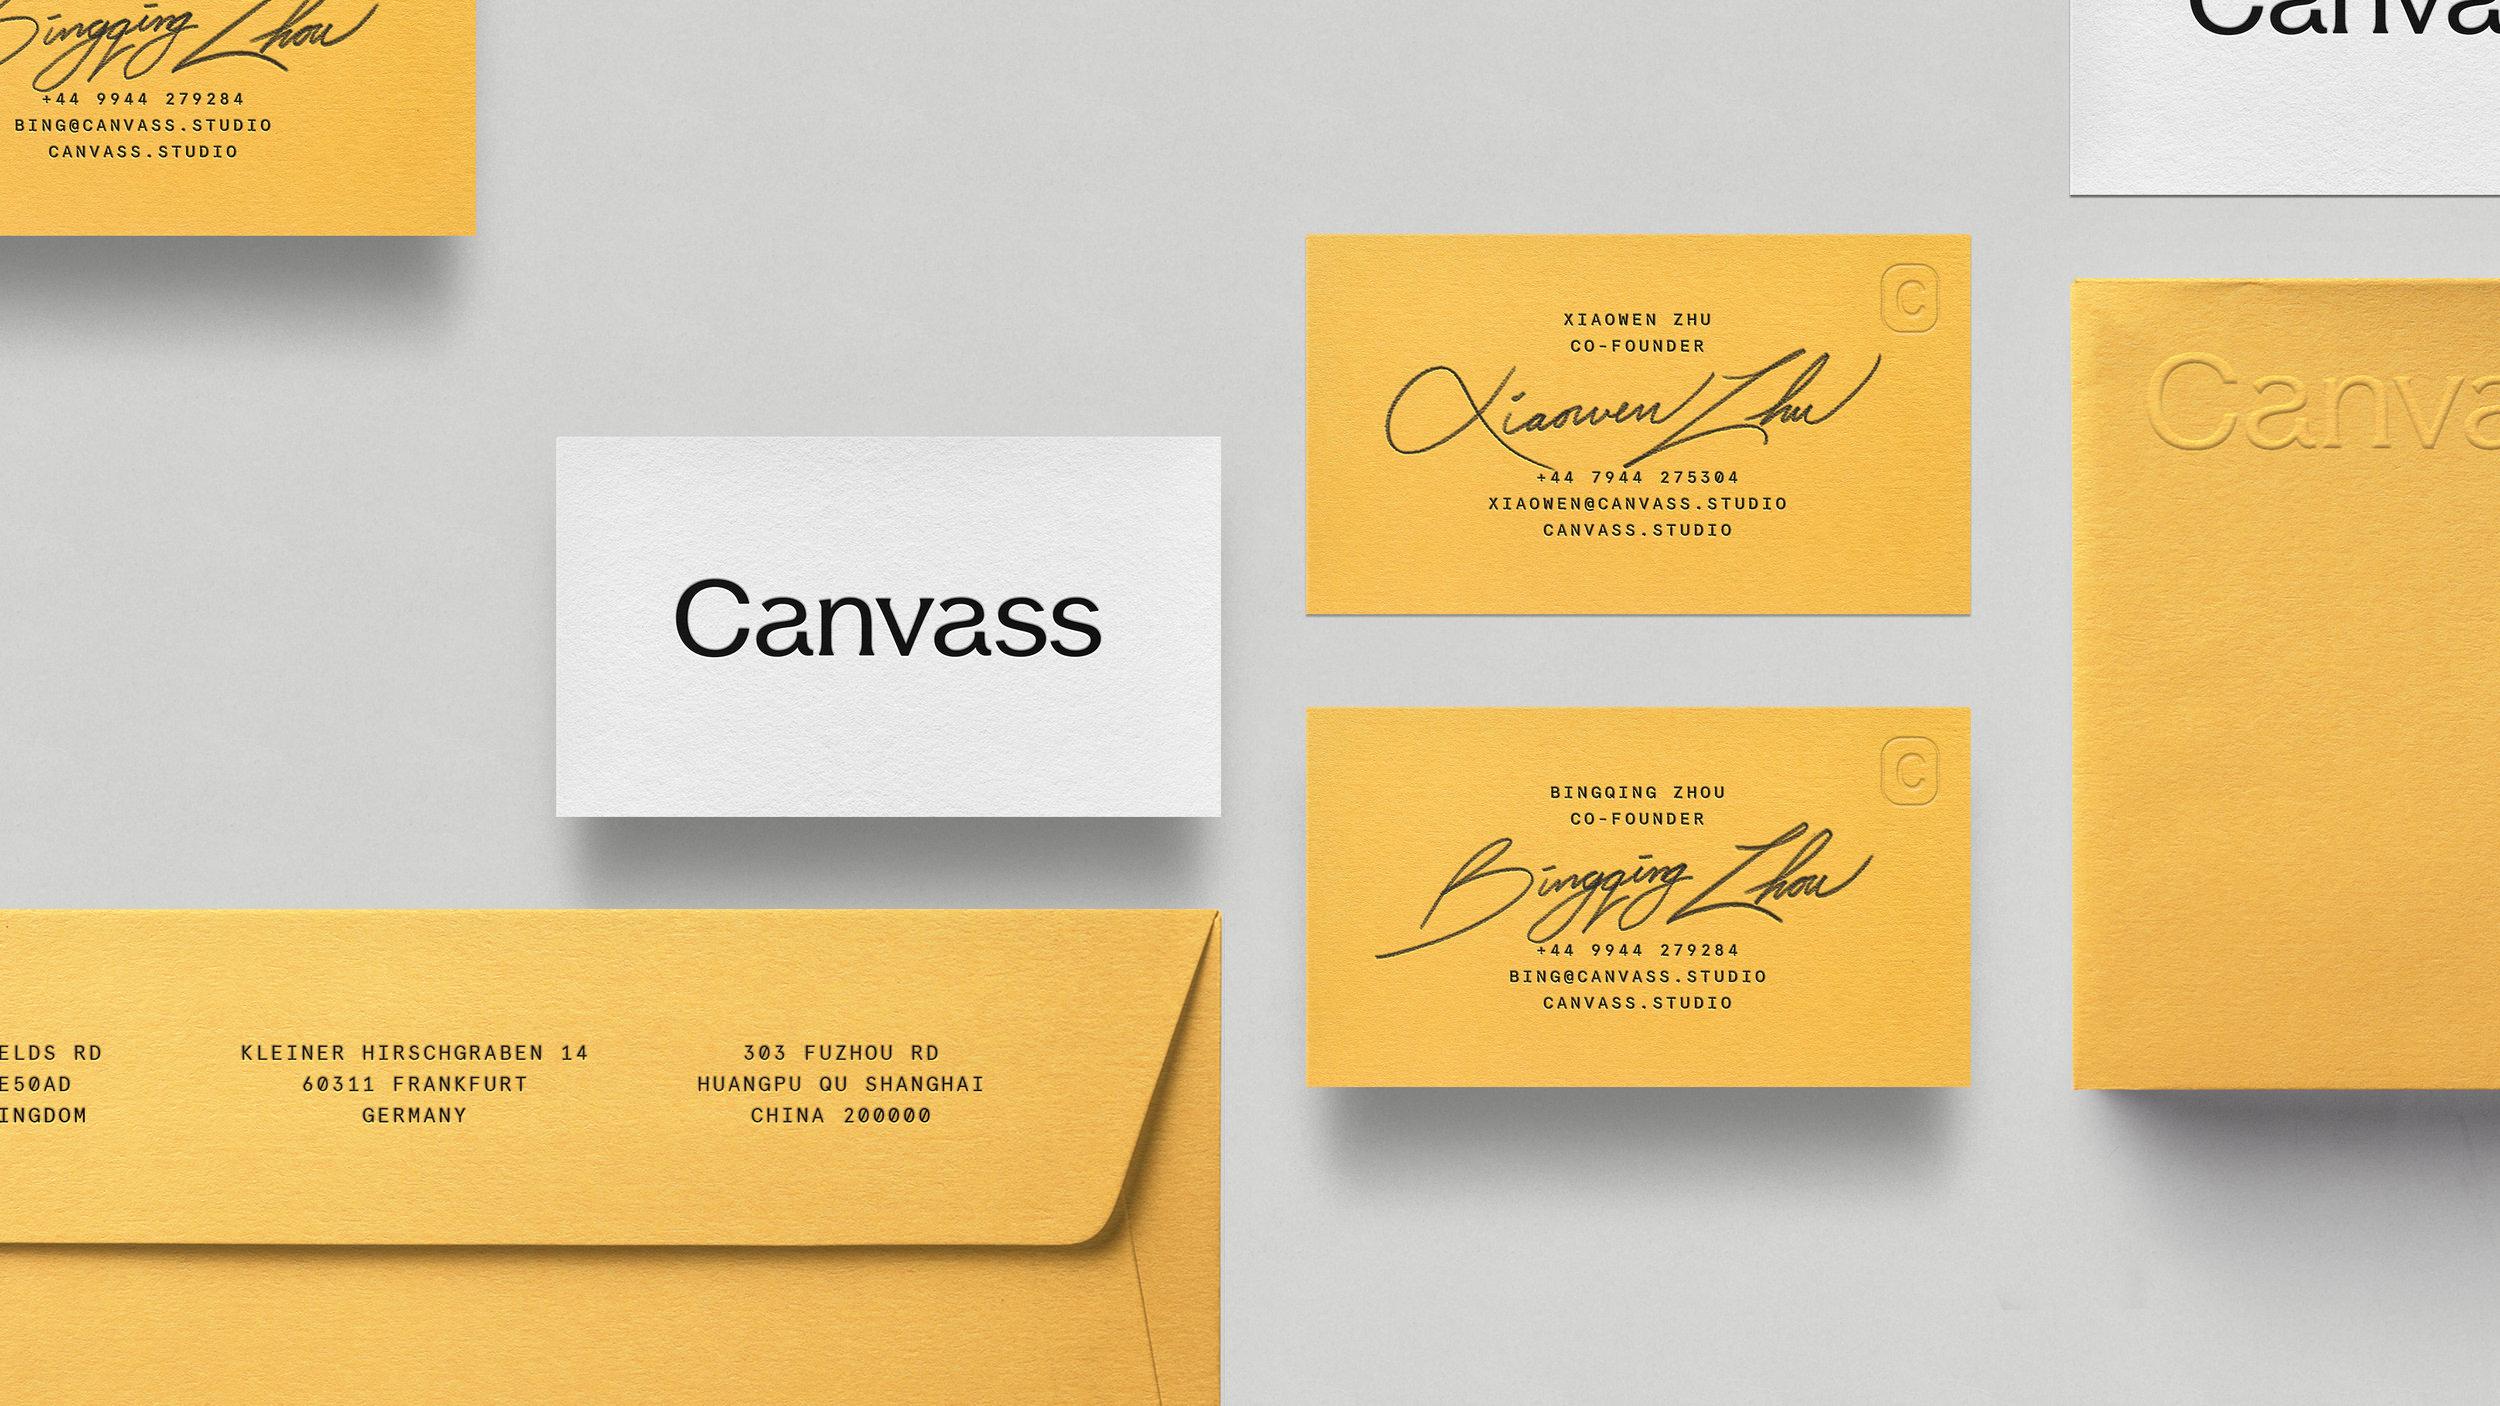 00_Canvass_Stationery_01.jpg